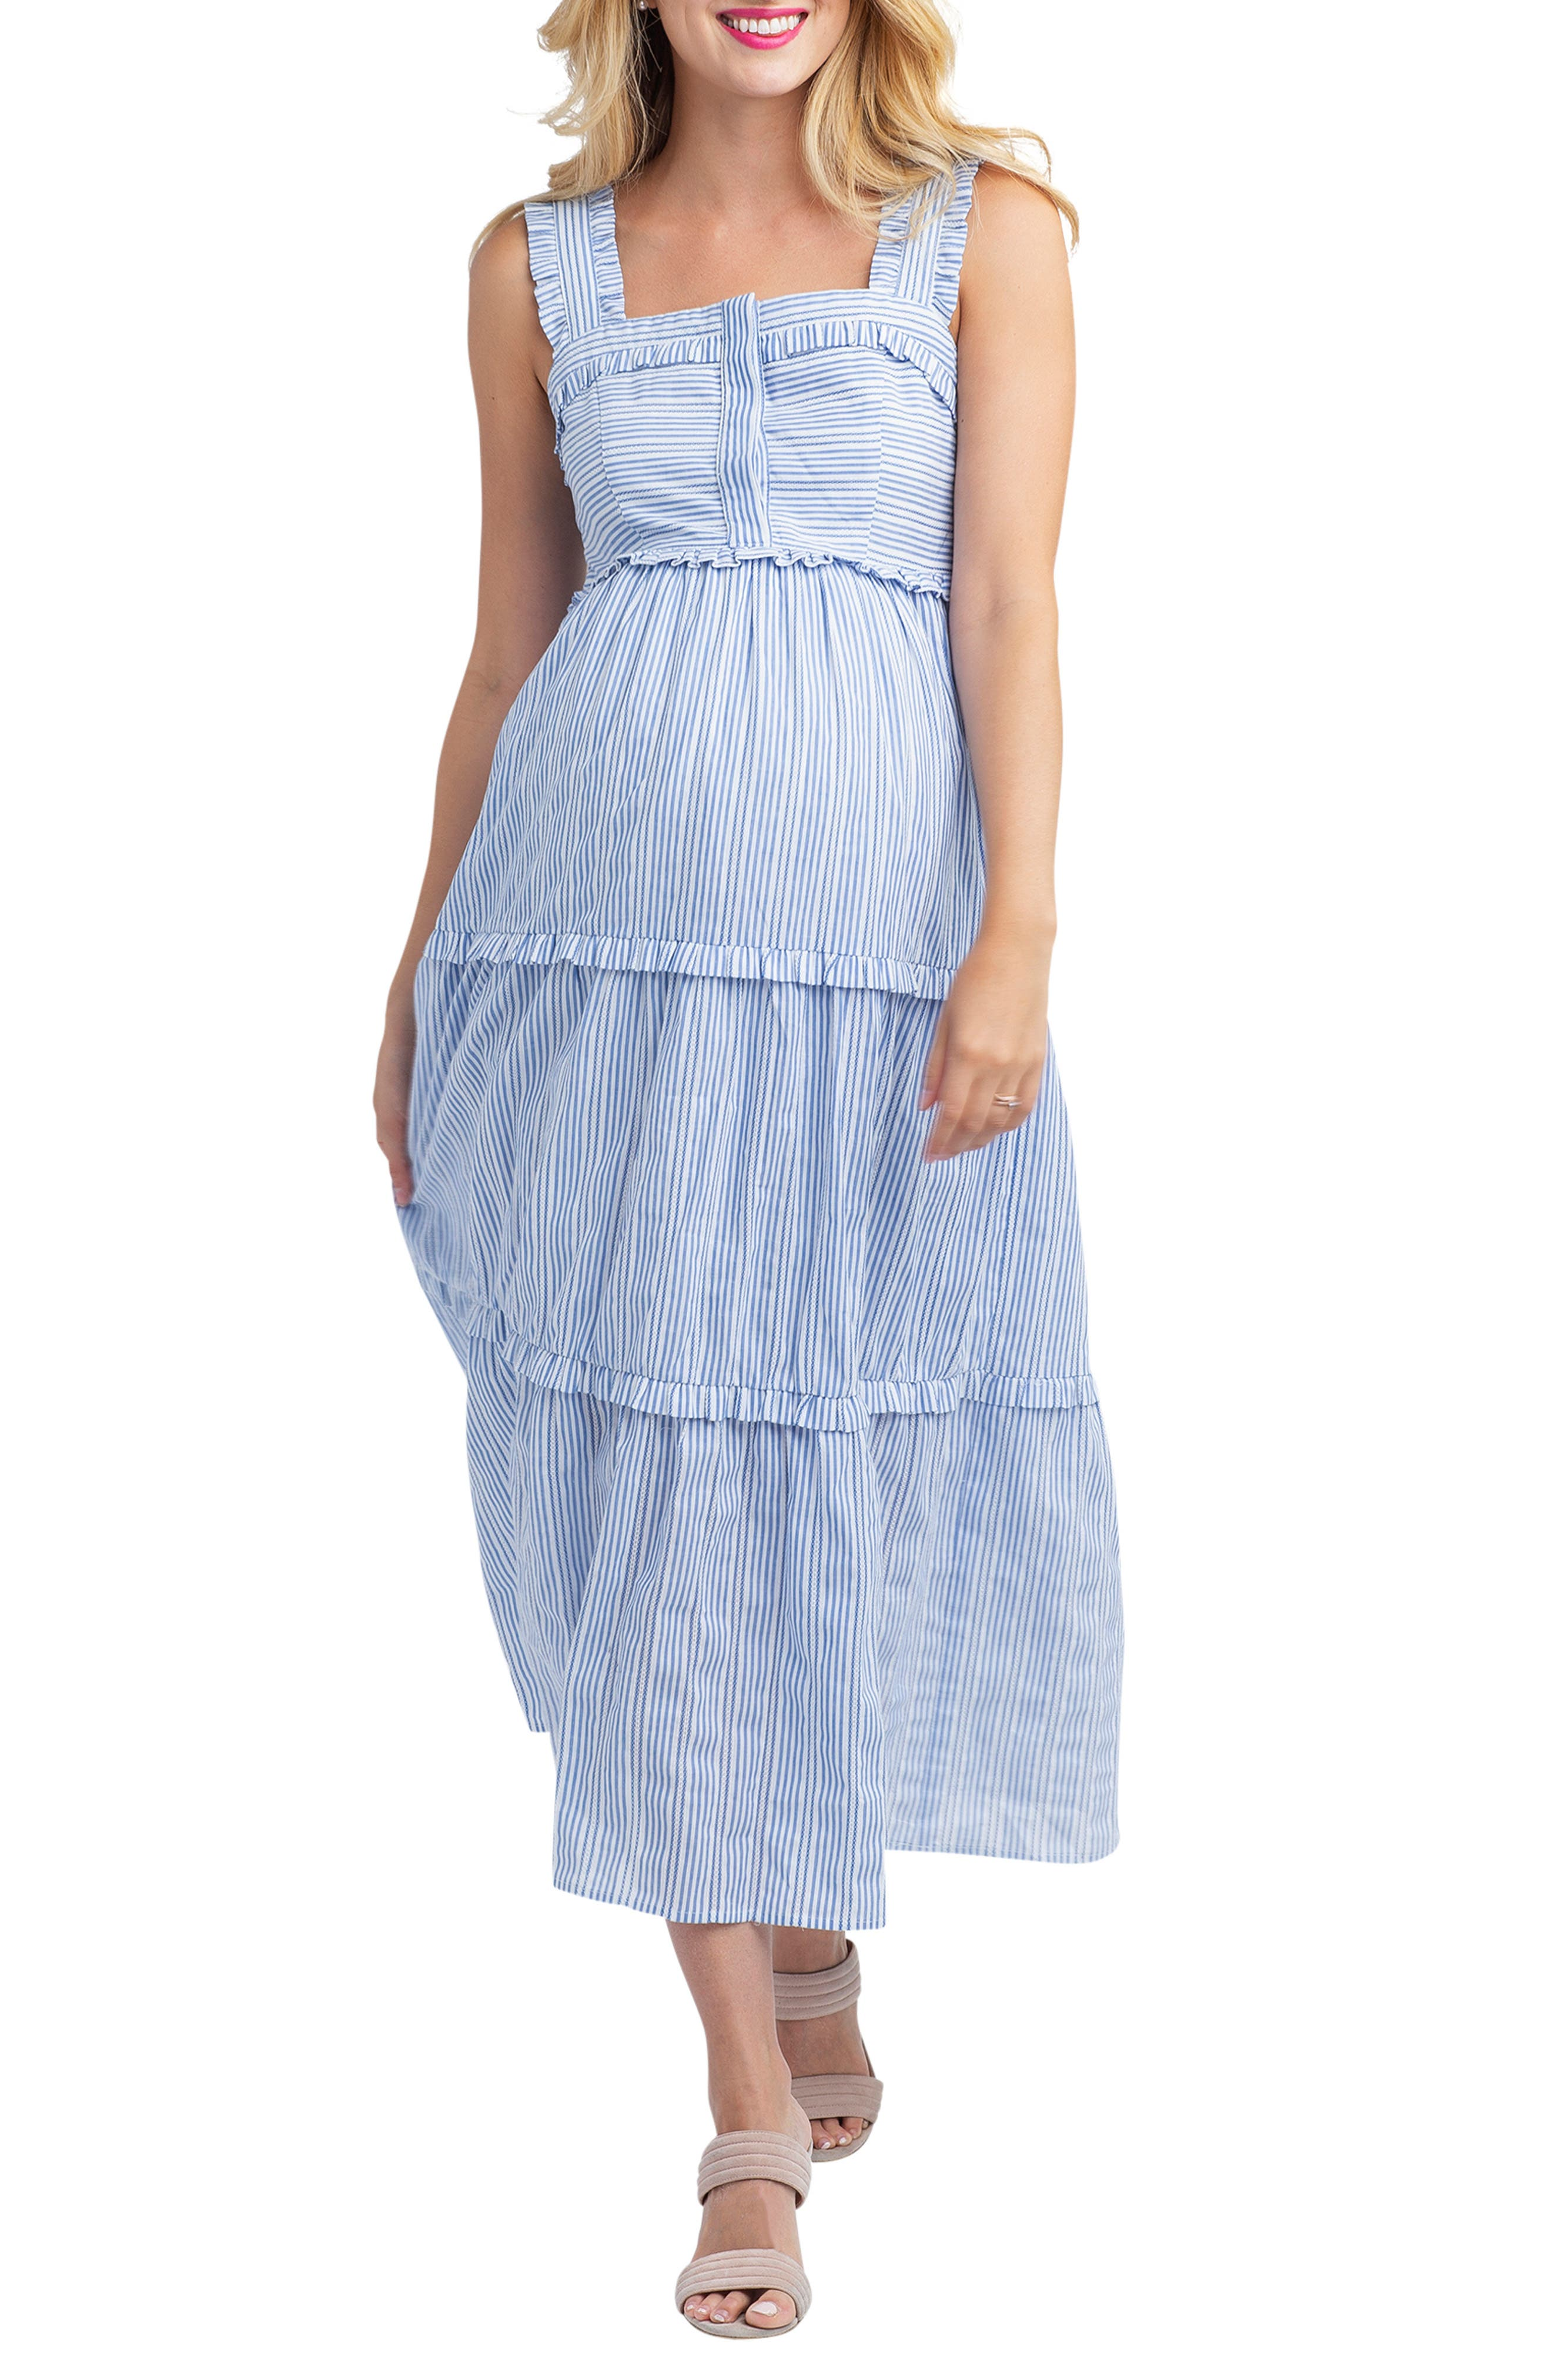 Vintage Maternity Clothes History Womens Nom Maternity Emma Maternitynursing Midi Dress $116.00 AT vintagedancer.com